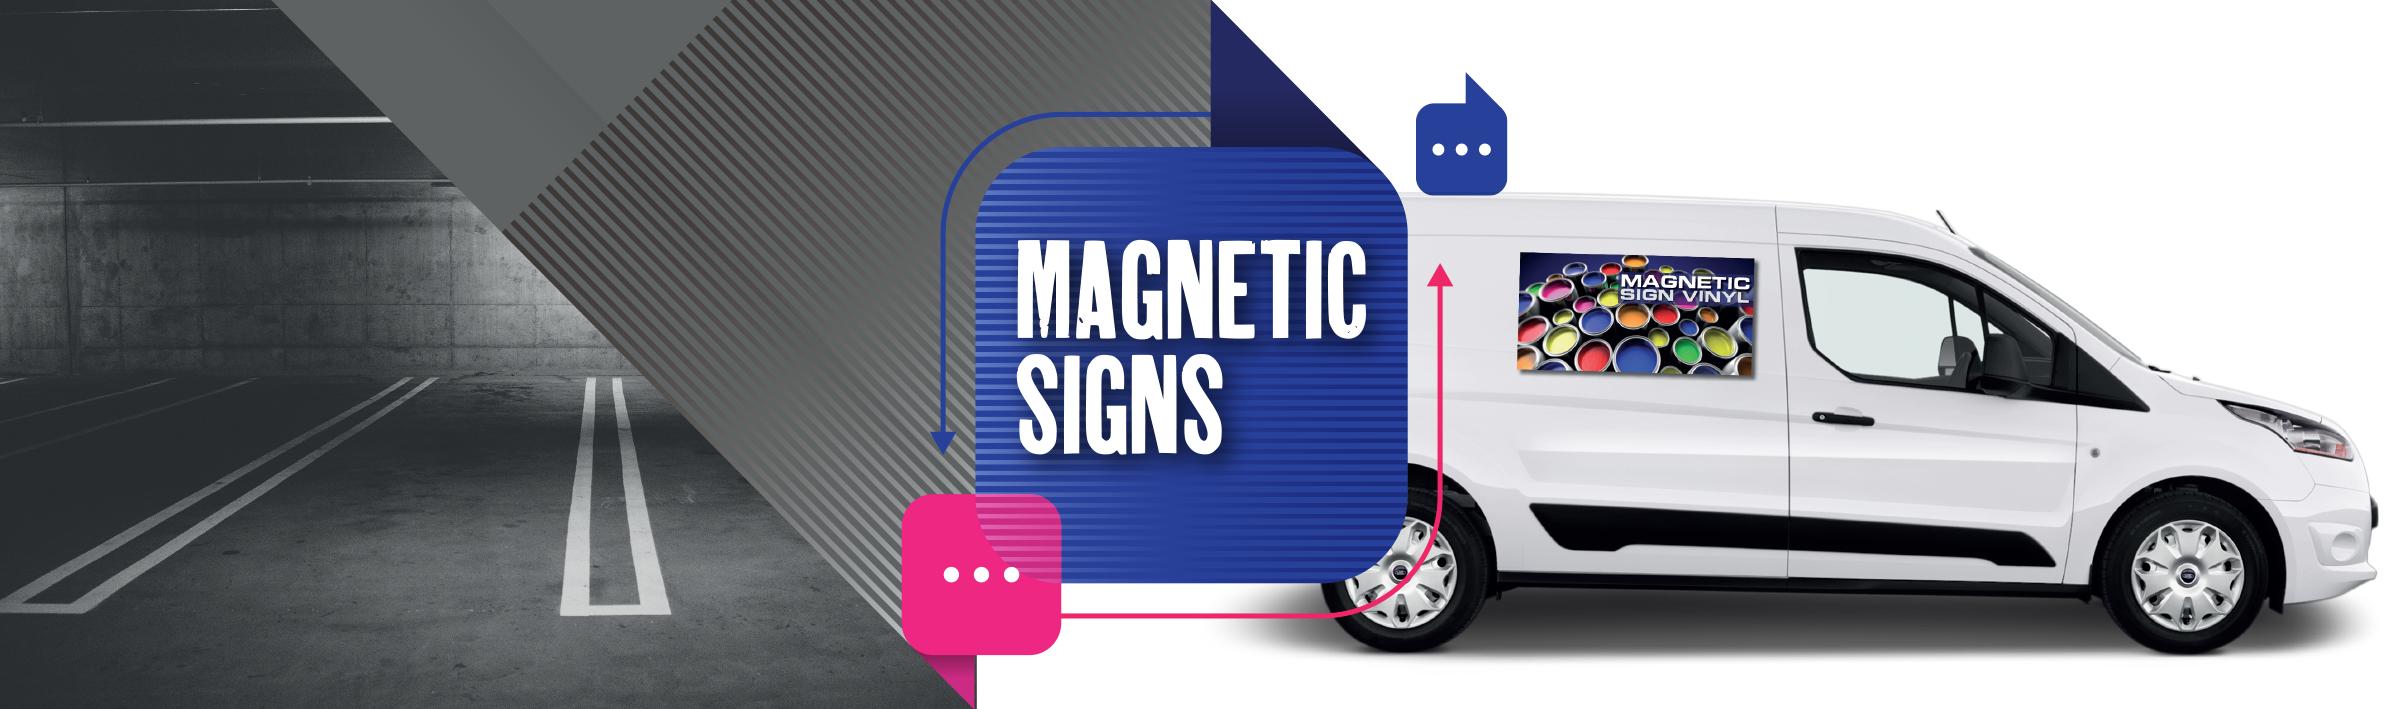 Magnetic Sign Product Slider 2021